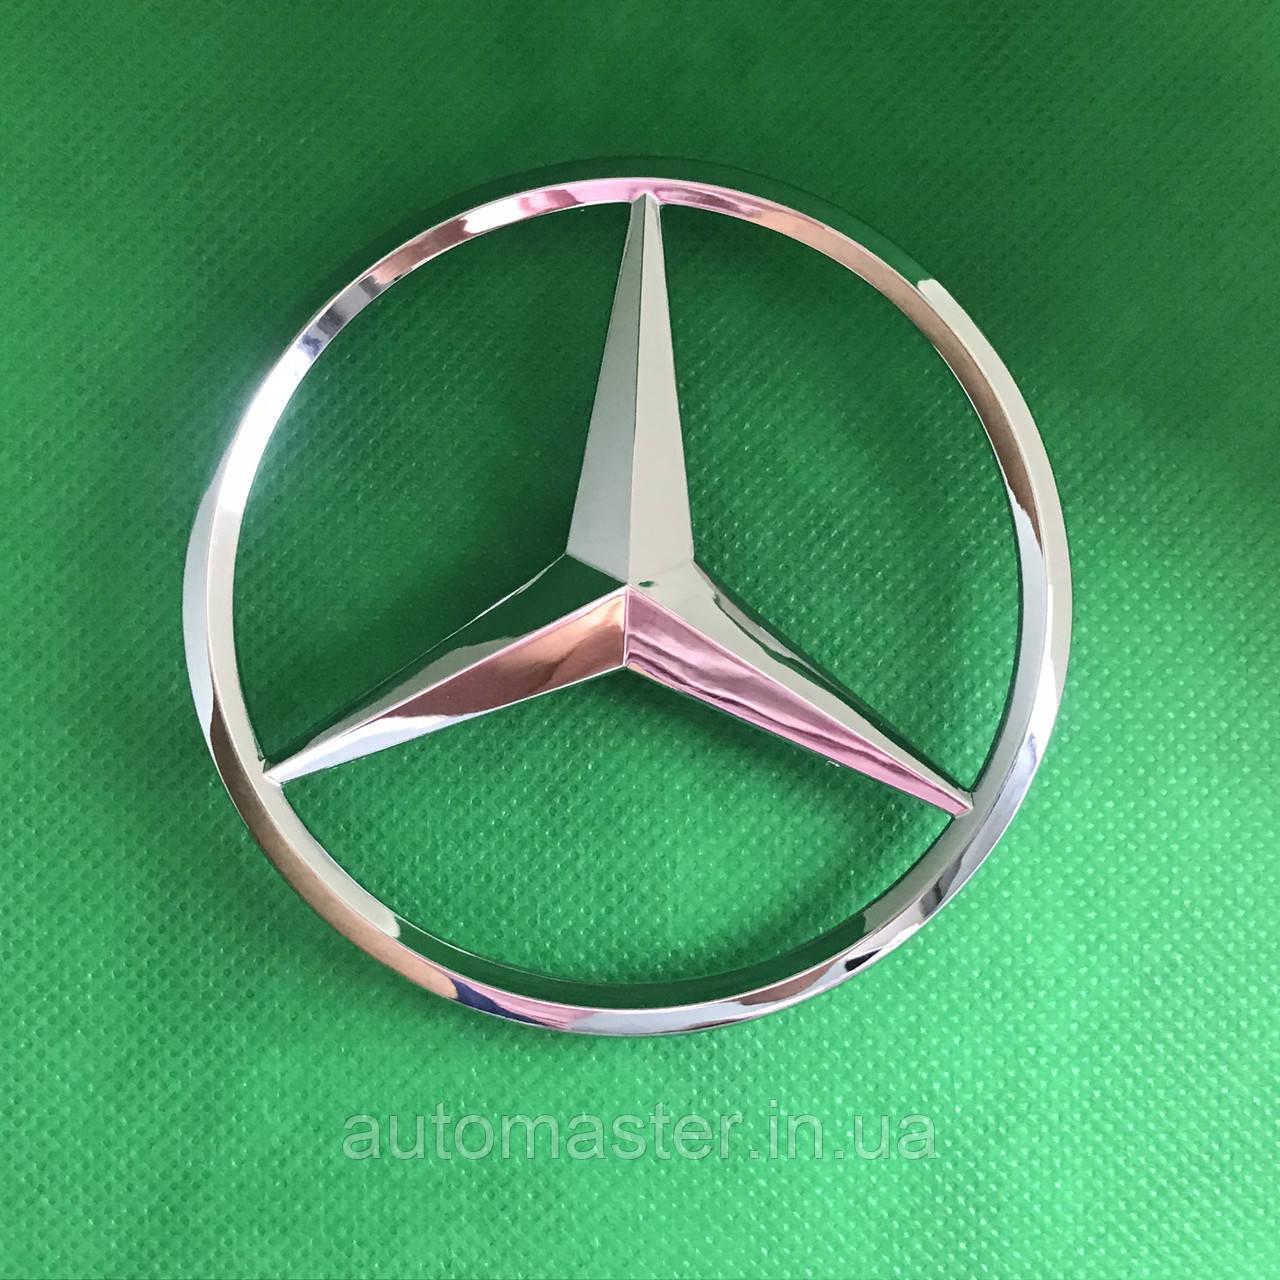 Эмблема на багажник Мерседес / Mercedes логотип значок 85 мм  3 пина